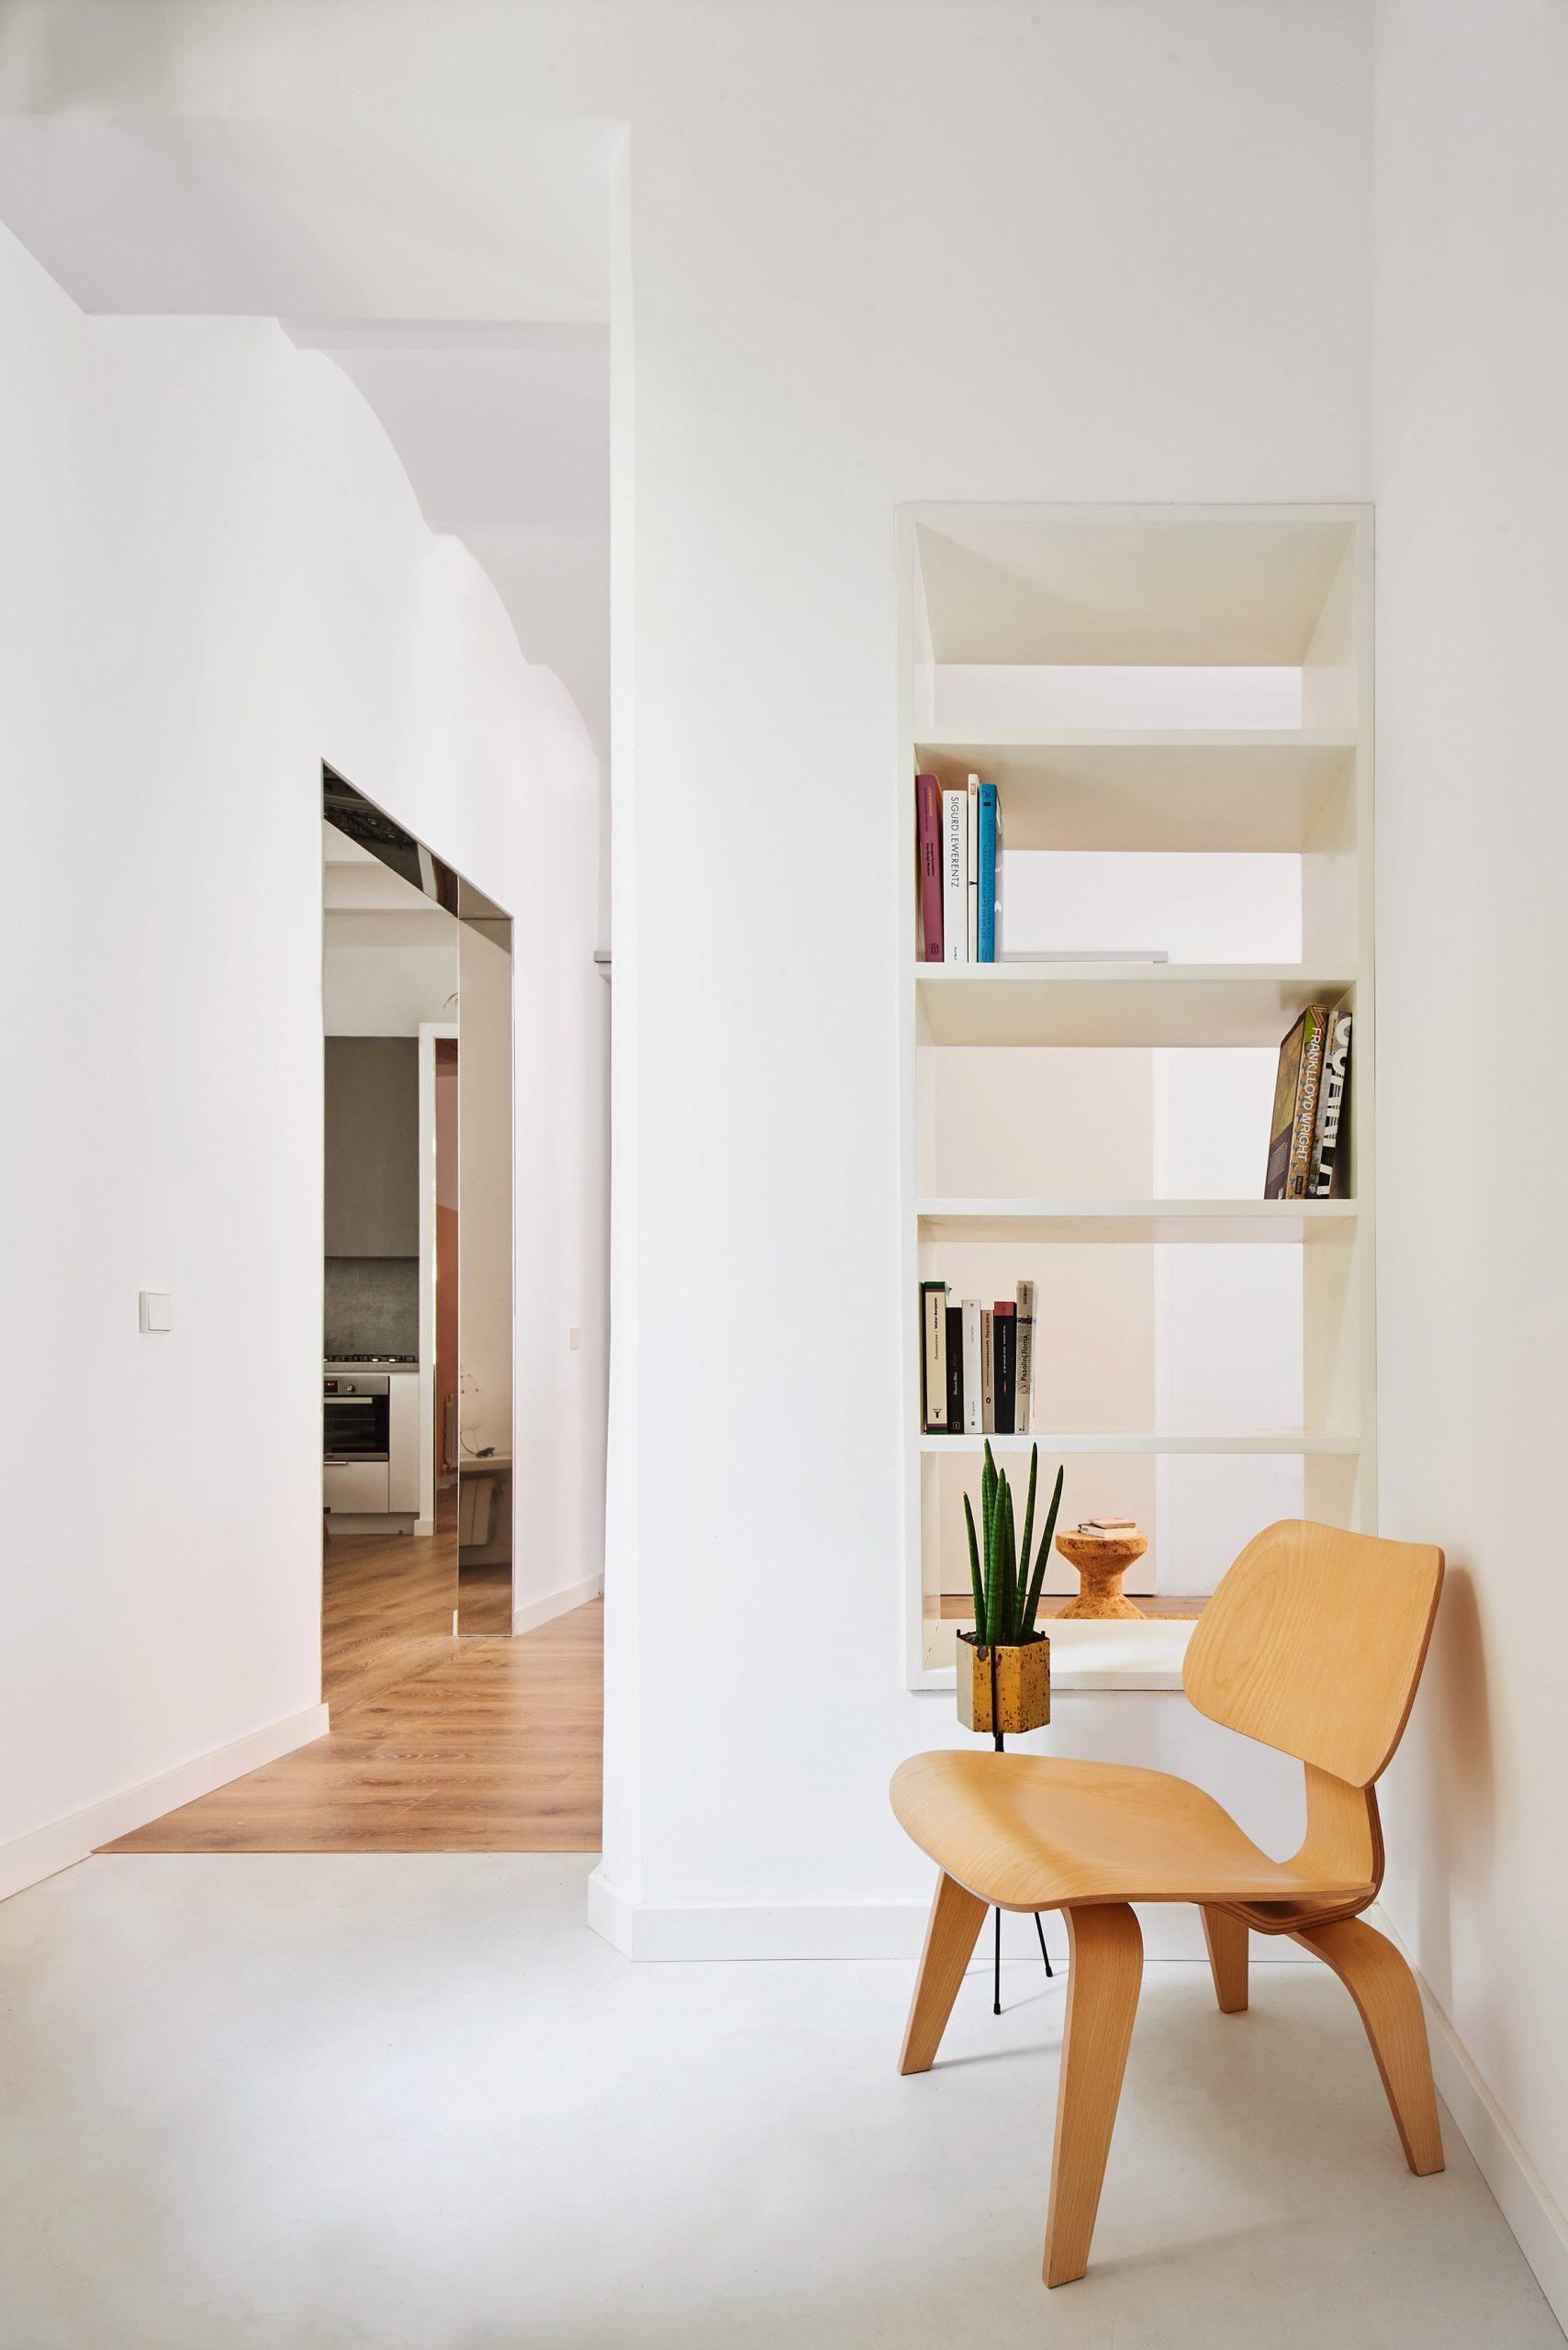 The Magic Box Apartment Raúl Sánchez Architects